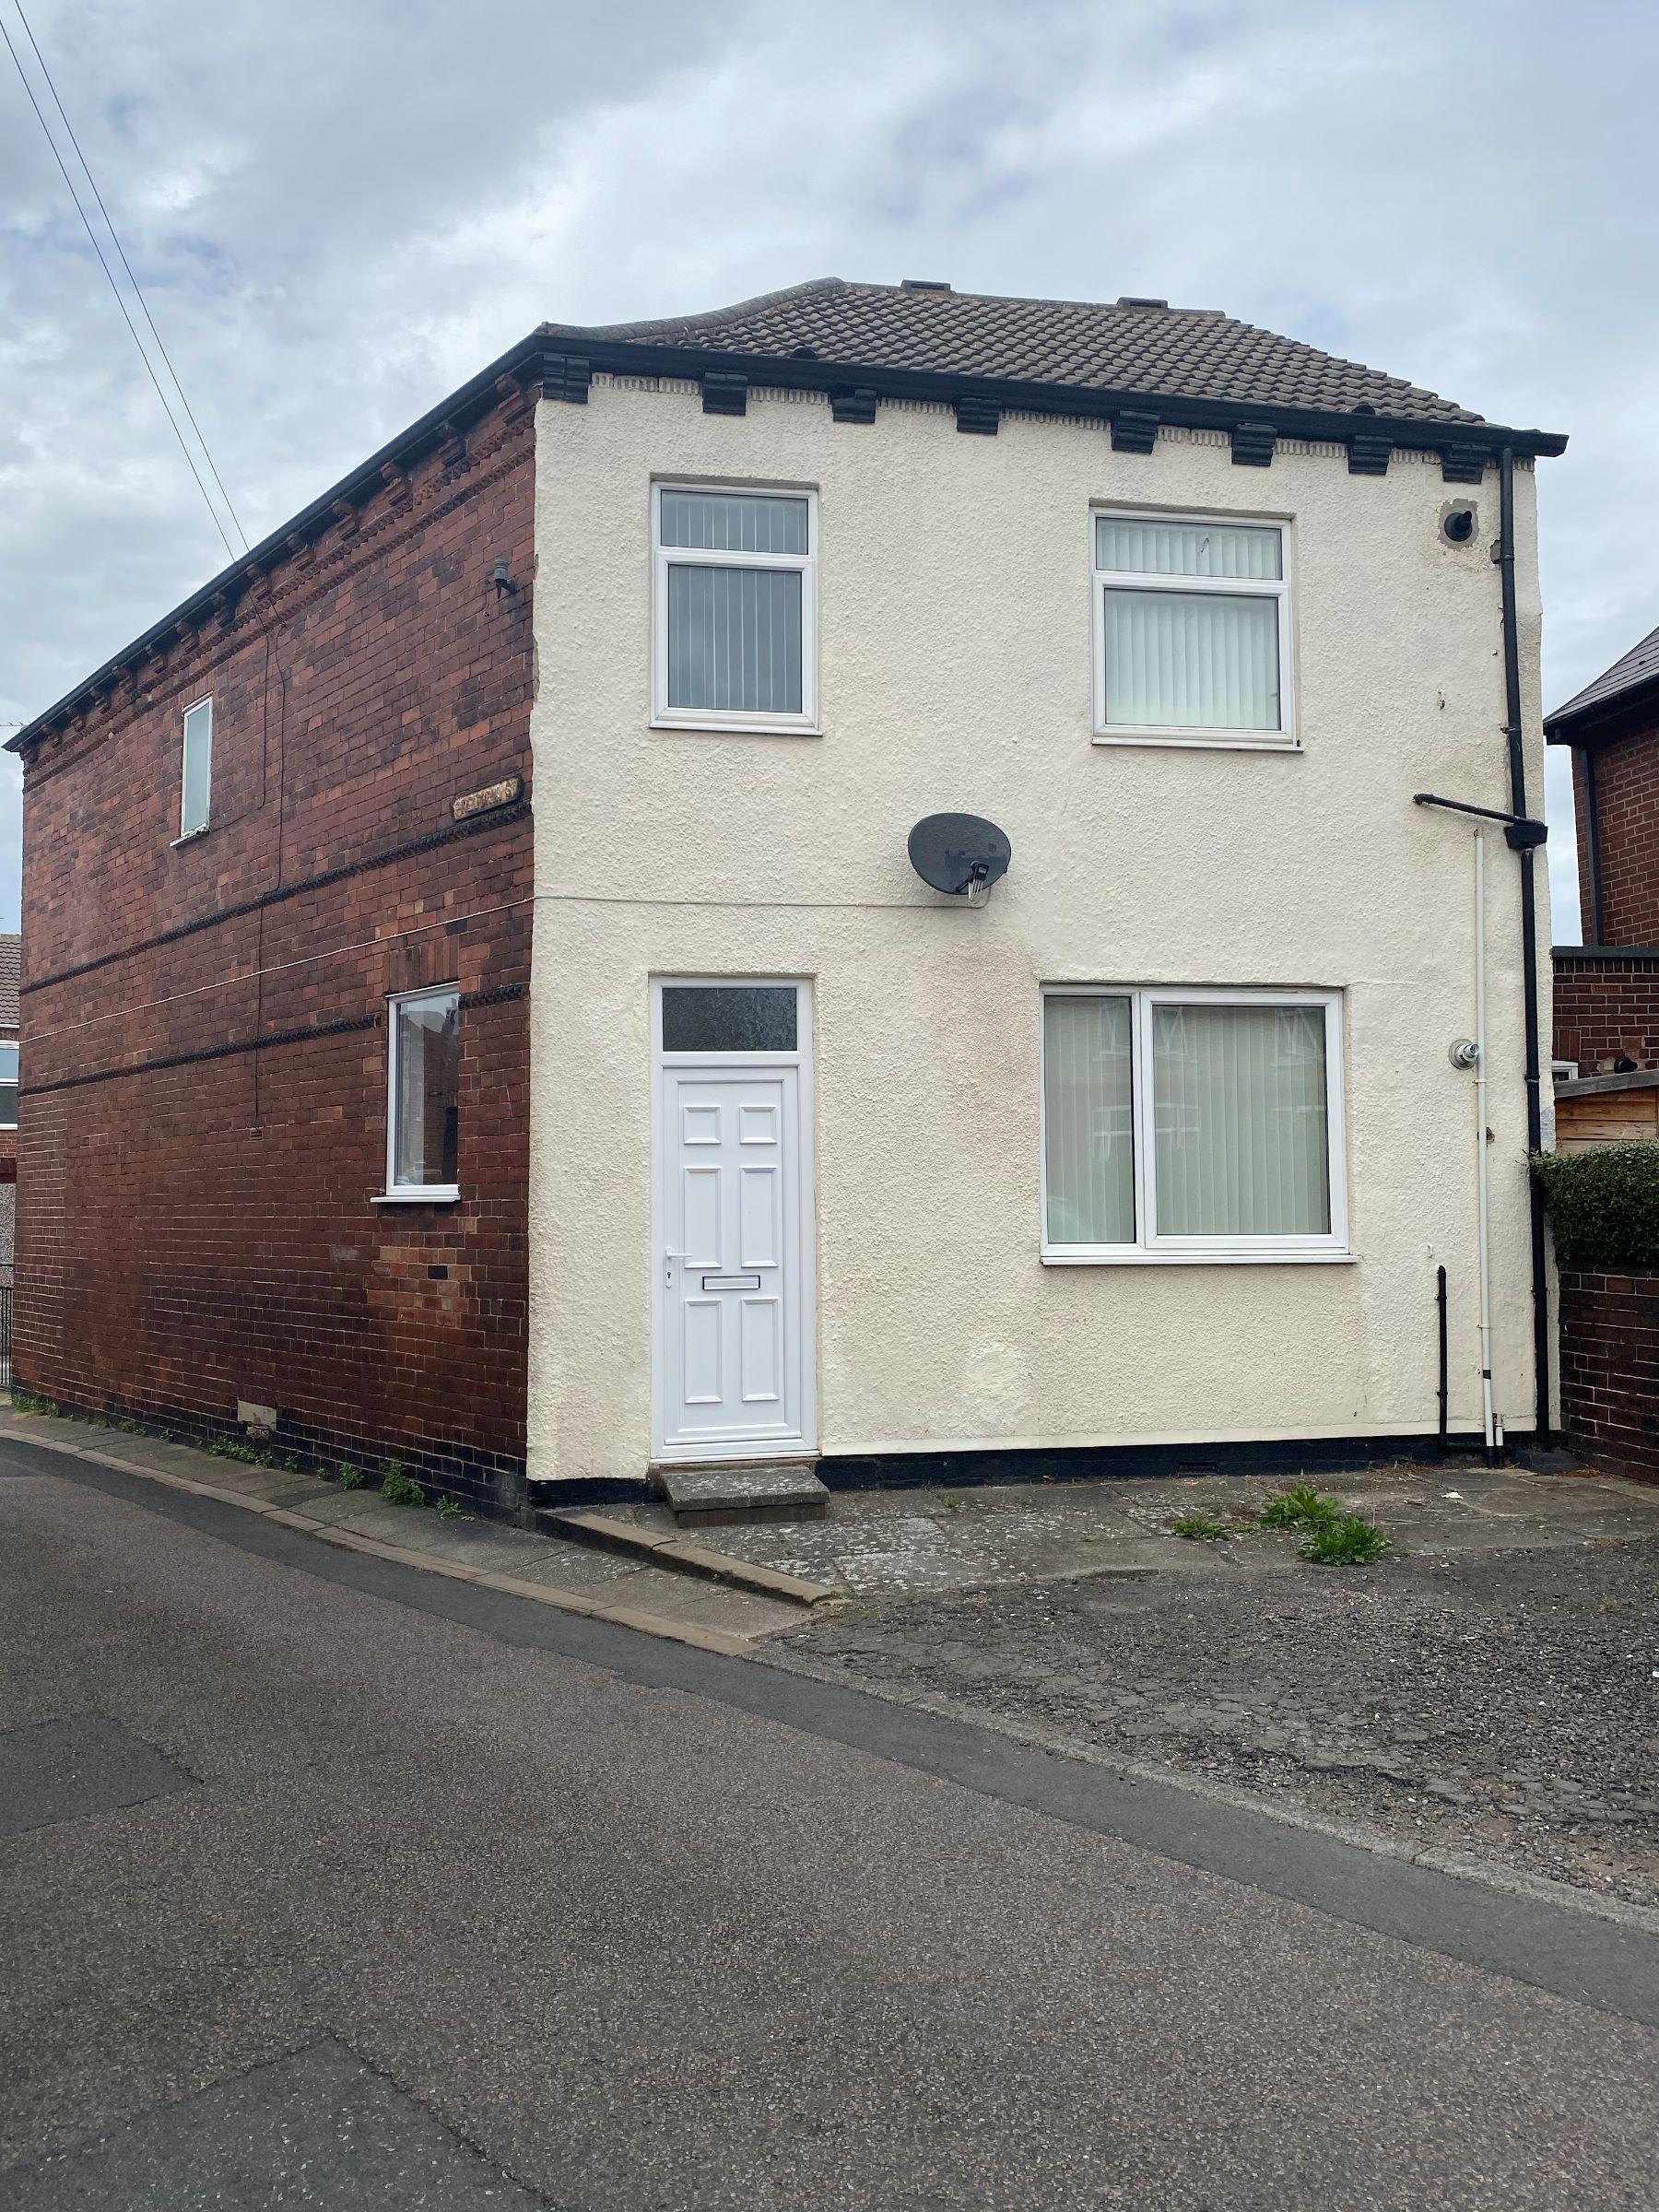 223A Smawthorne Lane, Castleford